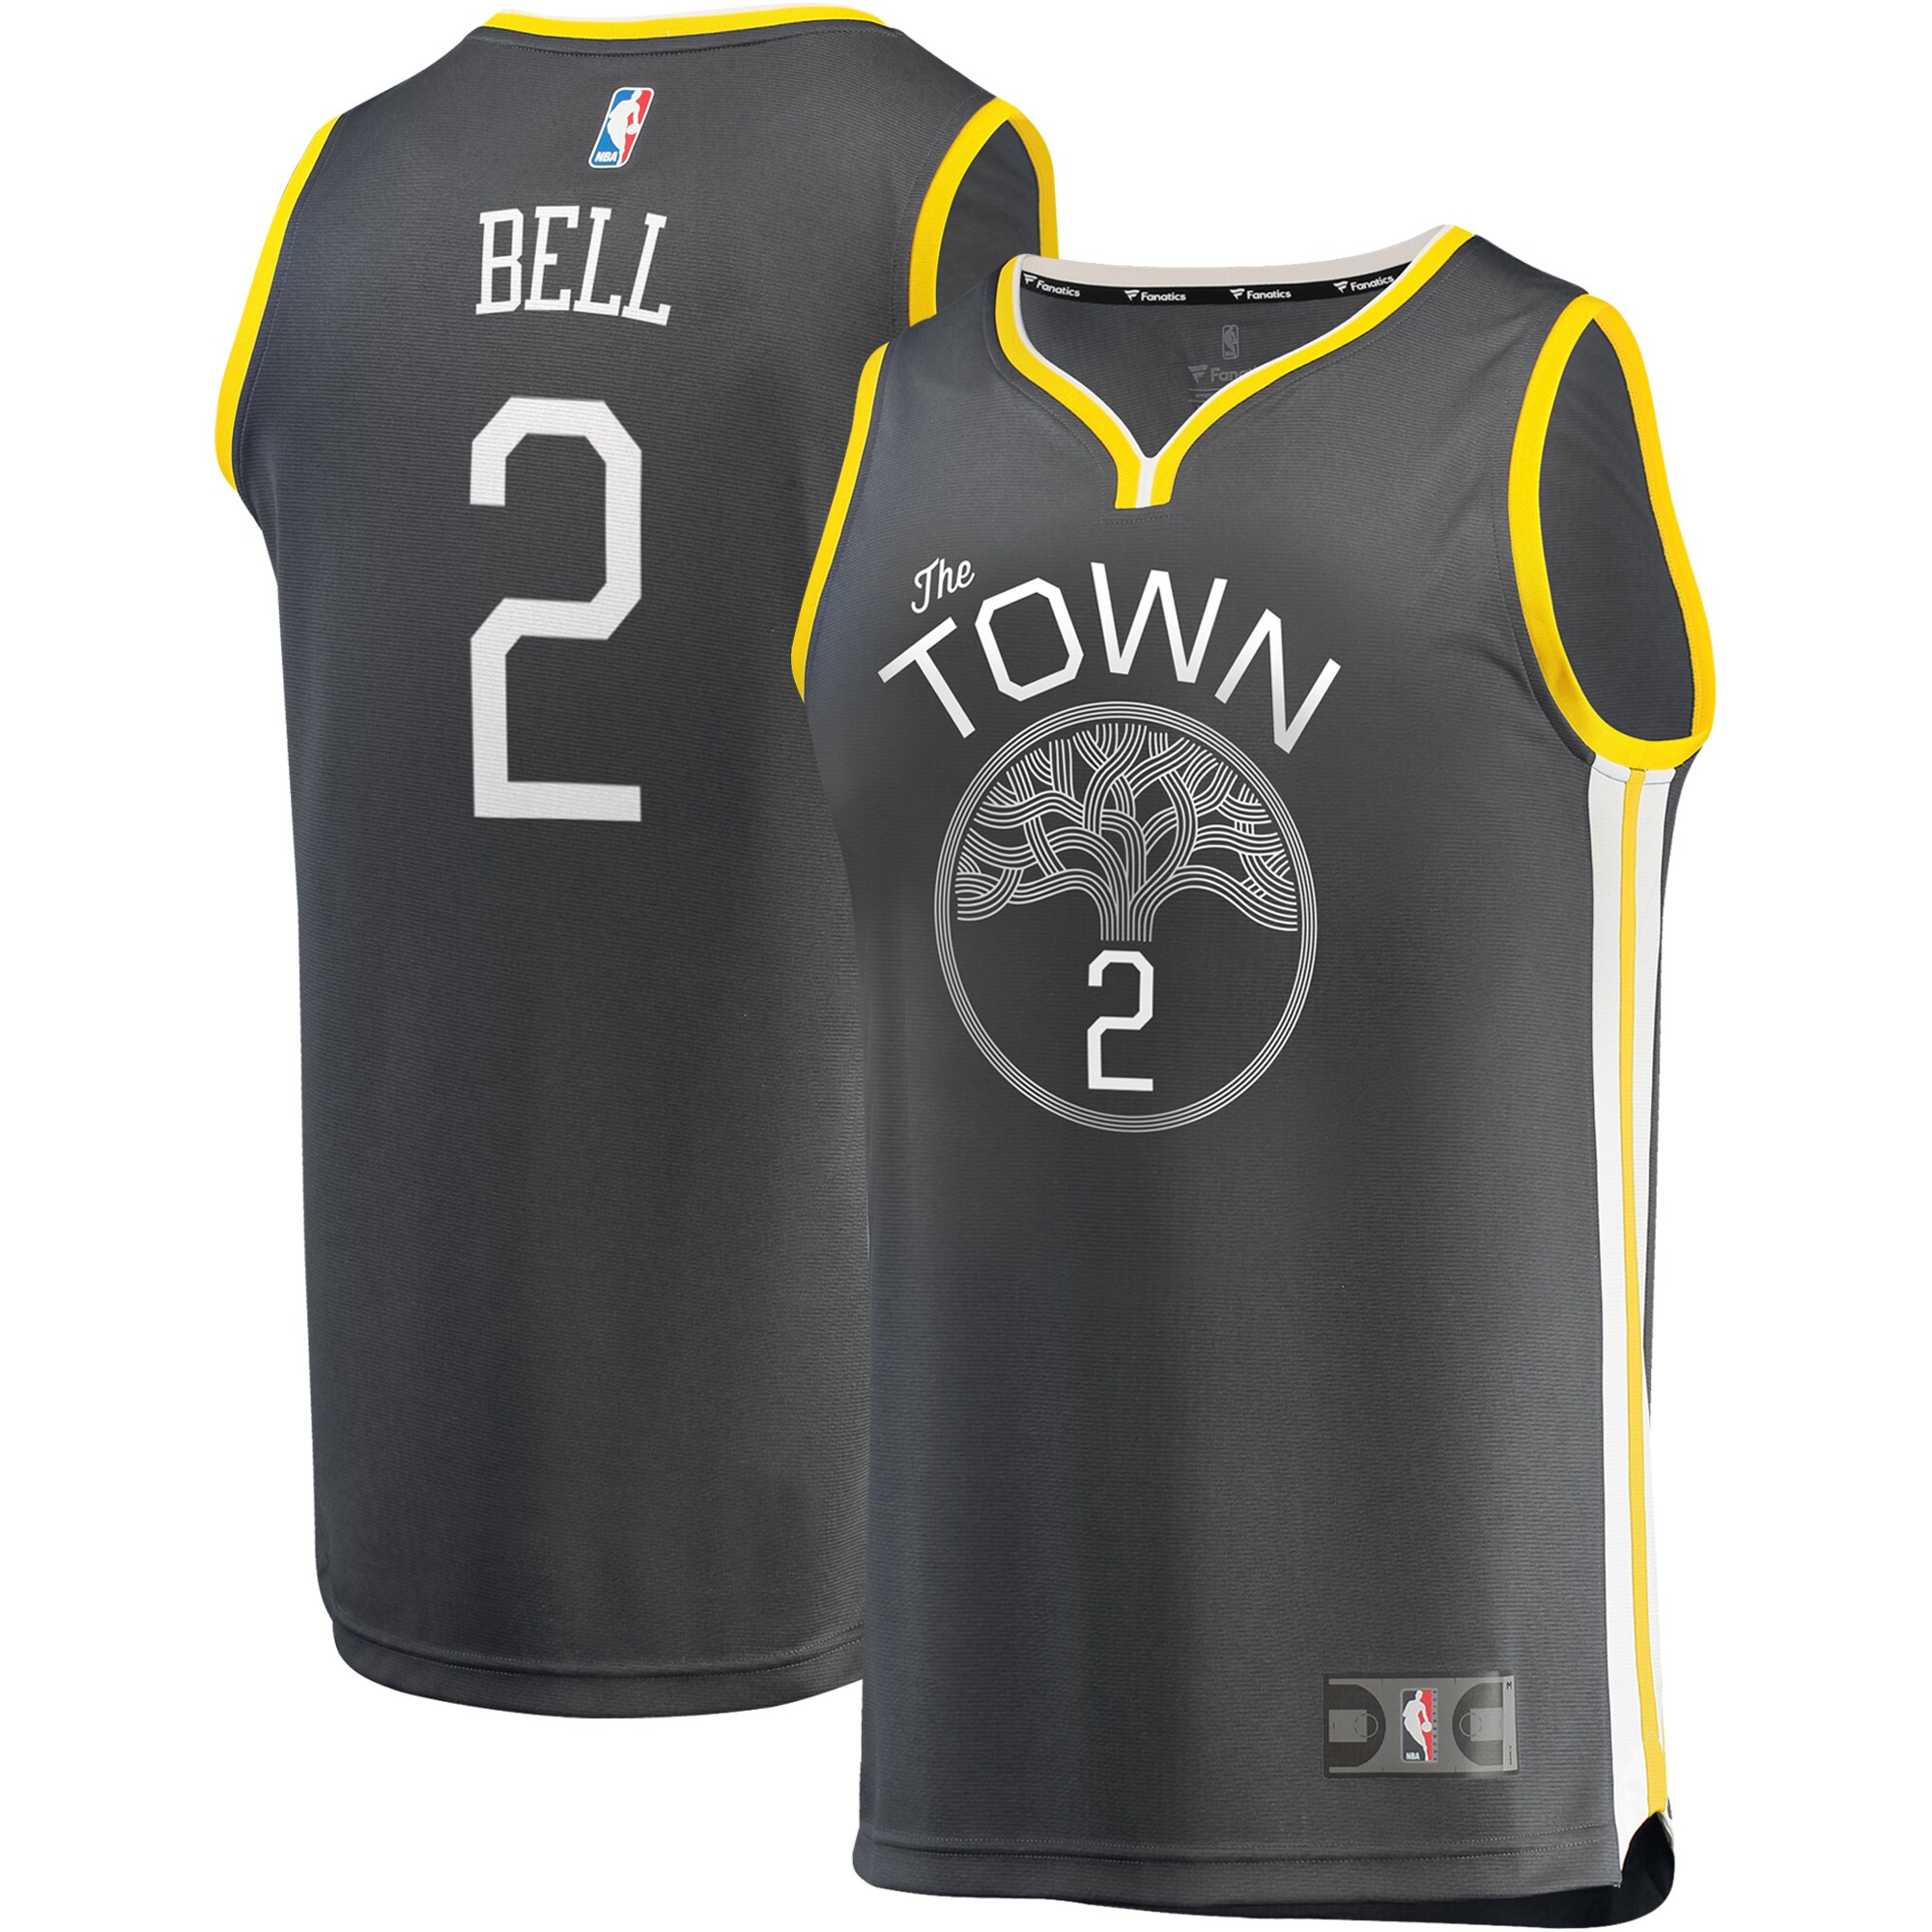 Jordan Bell Golden State Warriors Fanatics Branded Fast Break Replica Player Jersey Charcoal - Statement Edition